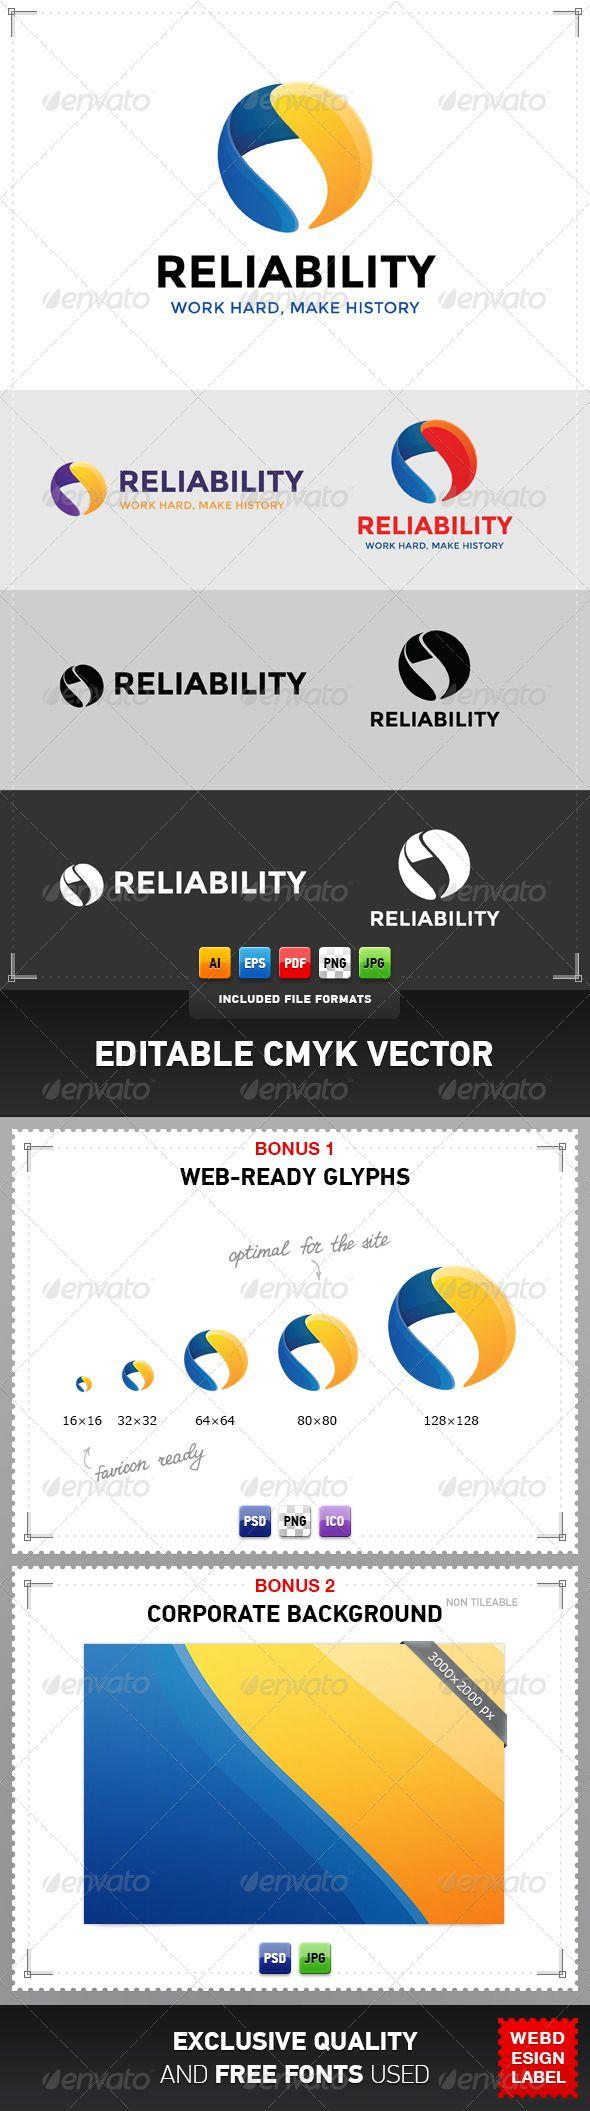 Reliability Logo | Logos, File format and Logo templates